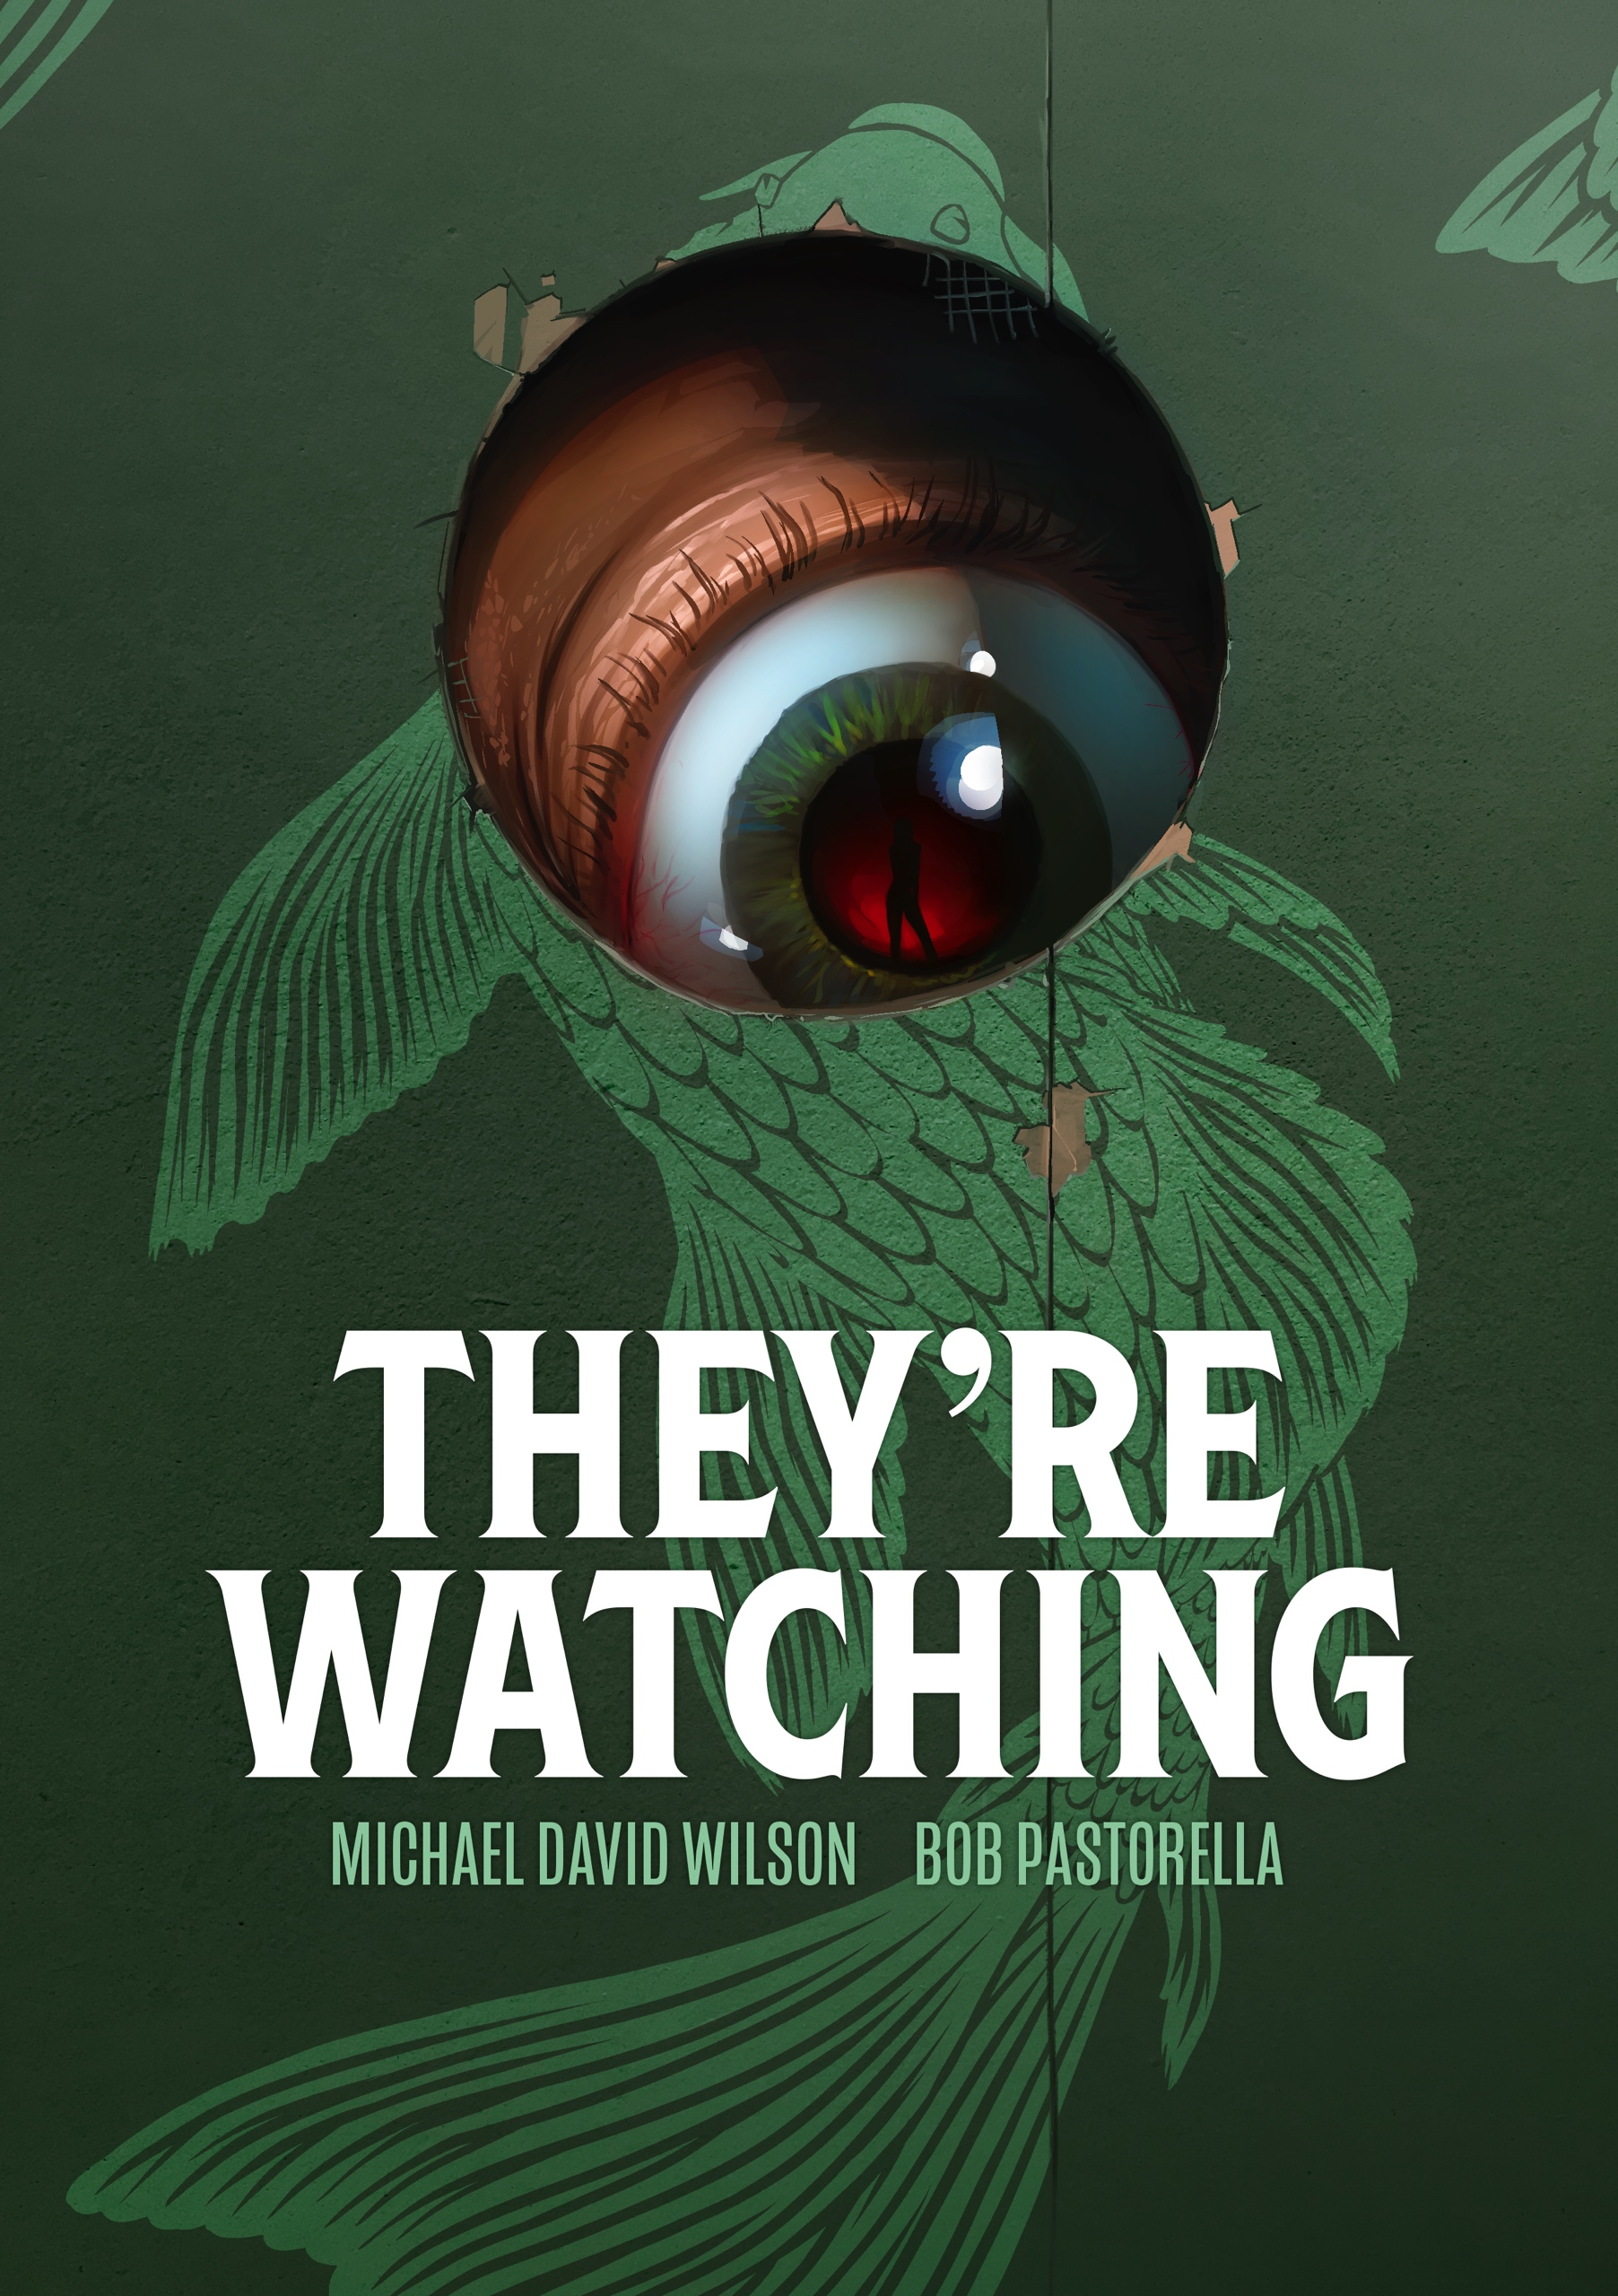 They're Watching by Bob Pastorella, Michael David Wilson